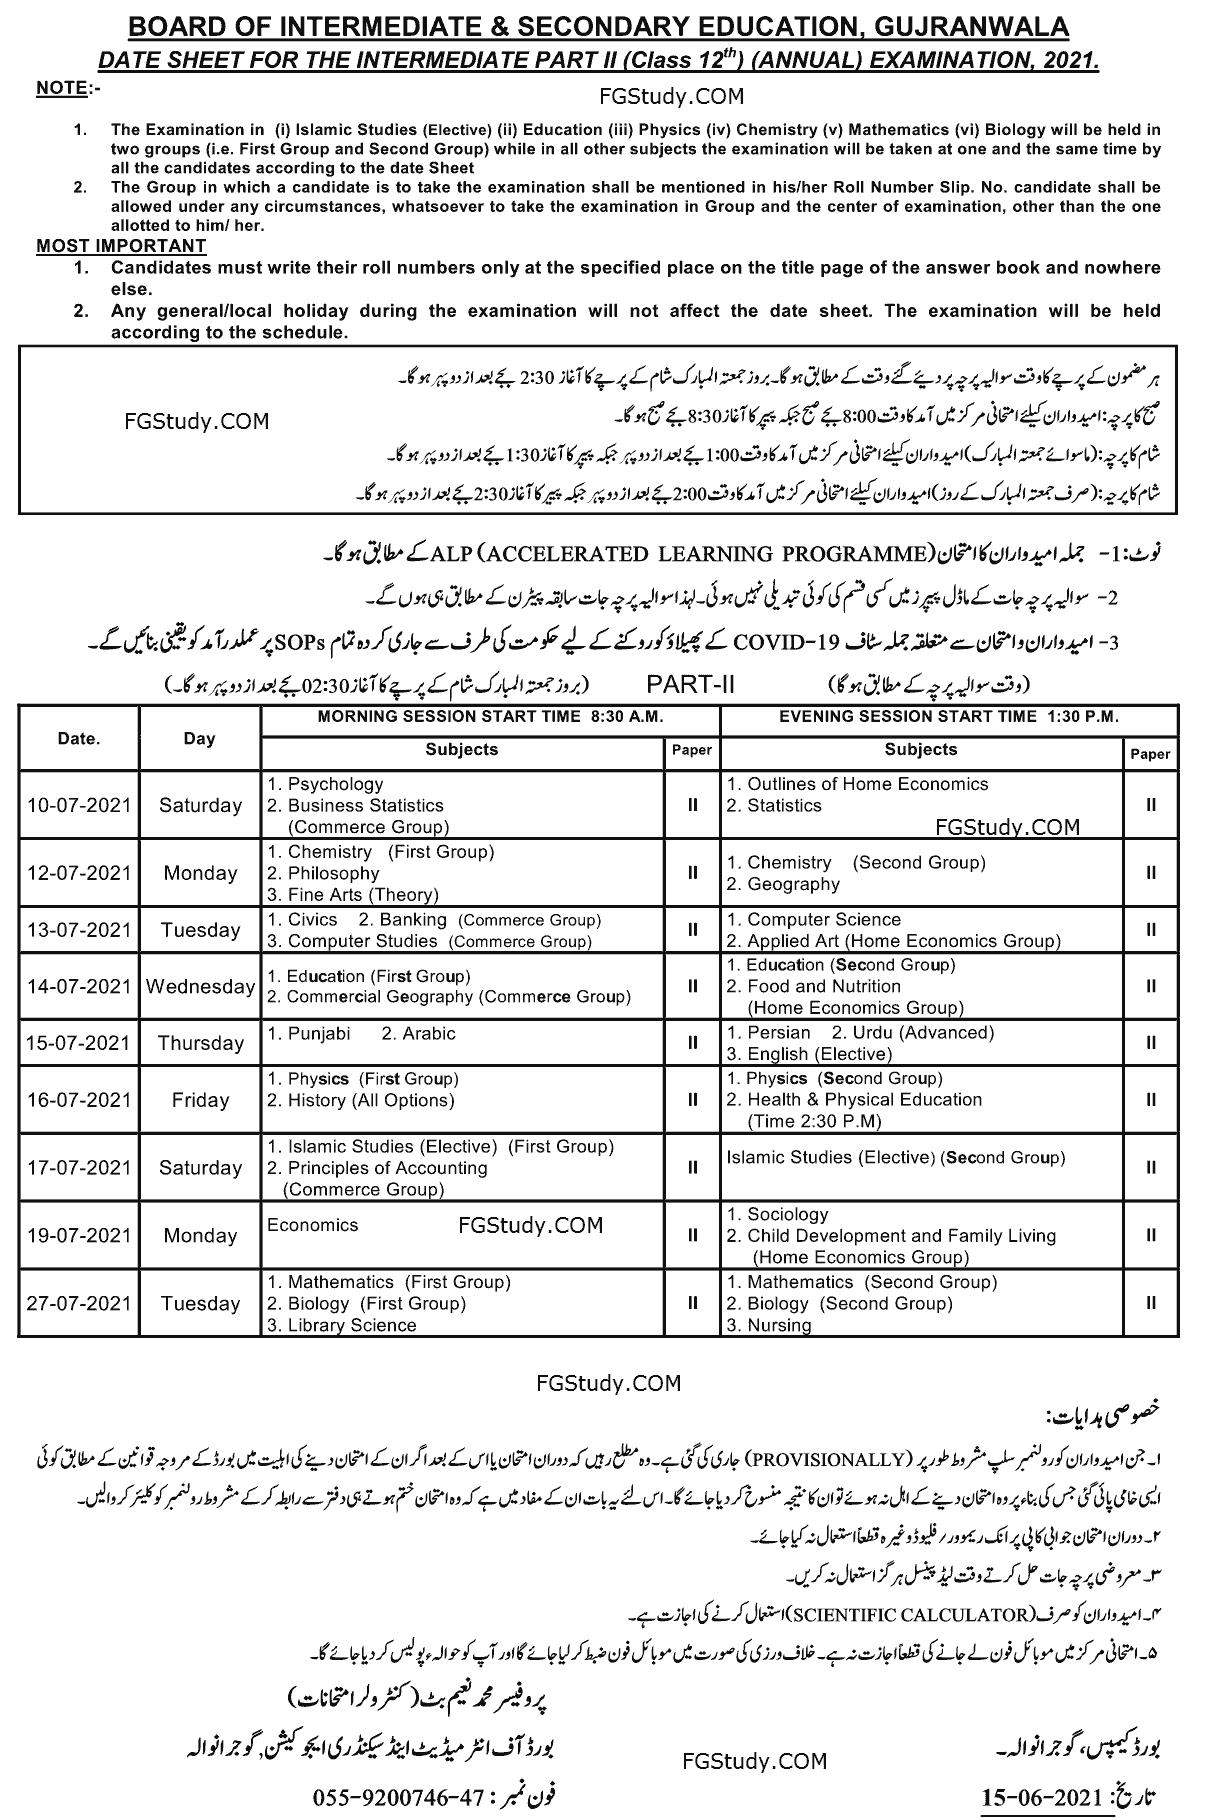 12th-class-datesheet-gujranwala-board-2021.png